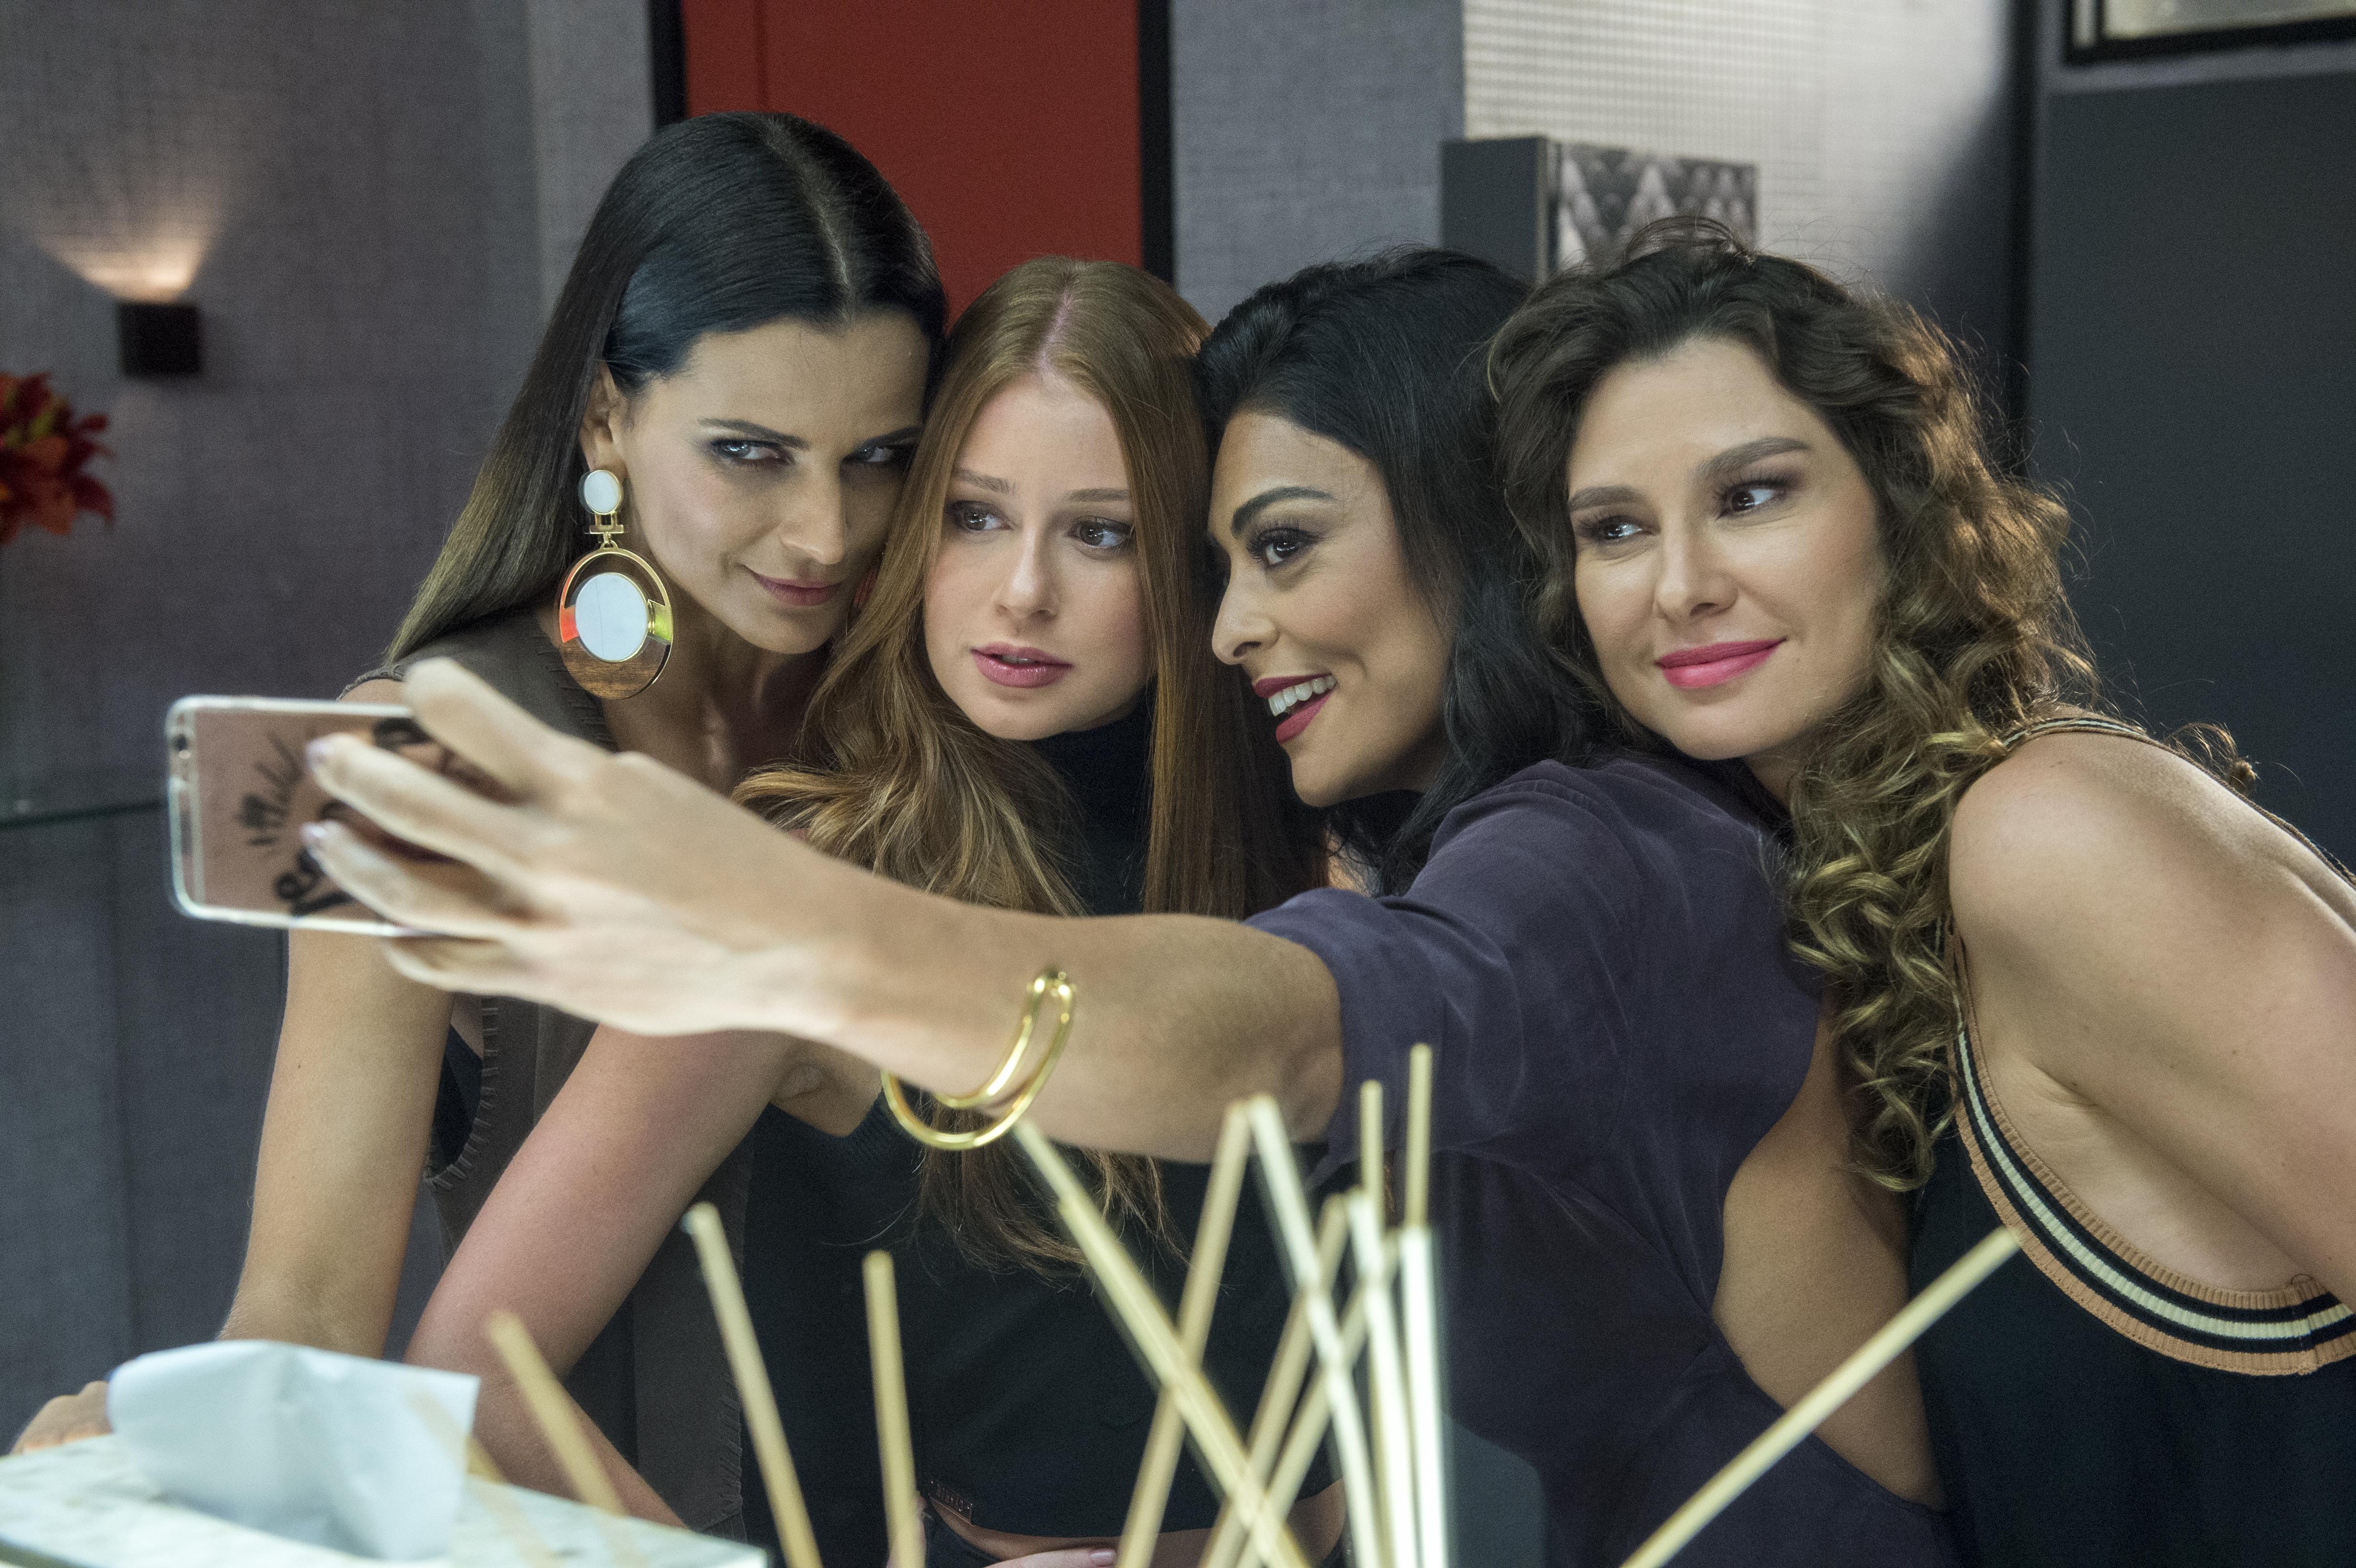 Daniele (Fernanda Motta), Carol (Juliana Paes), Natasha (Lavínia Vlasak) e Eliza (Marina Ruy Barbosa).